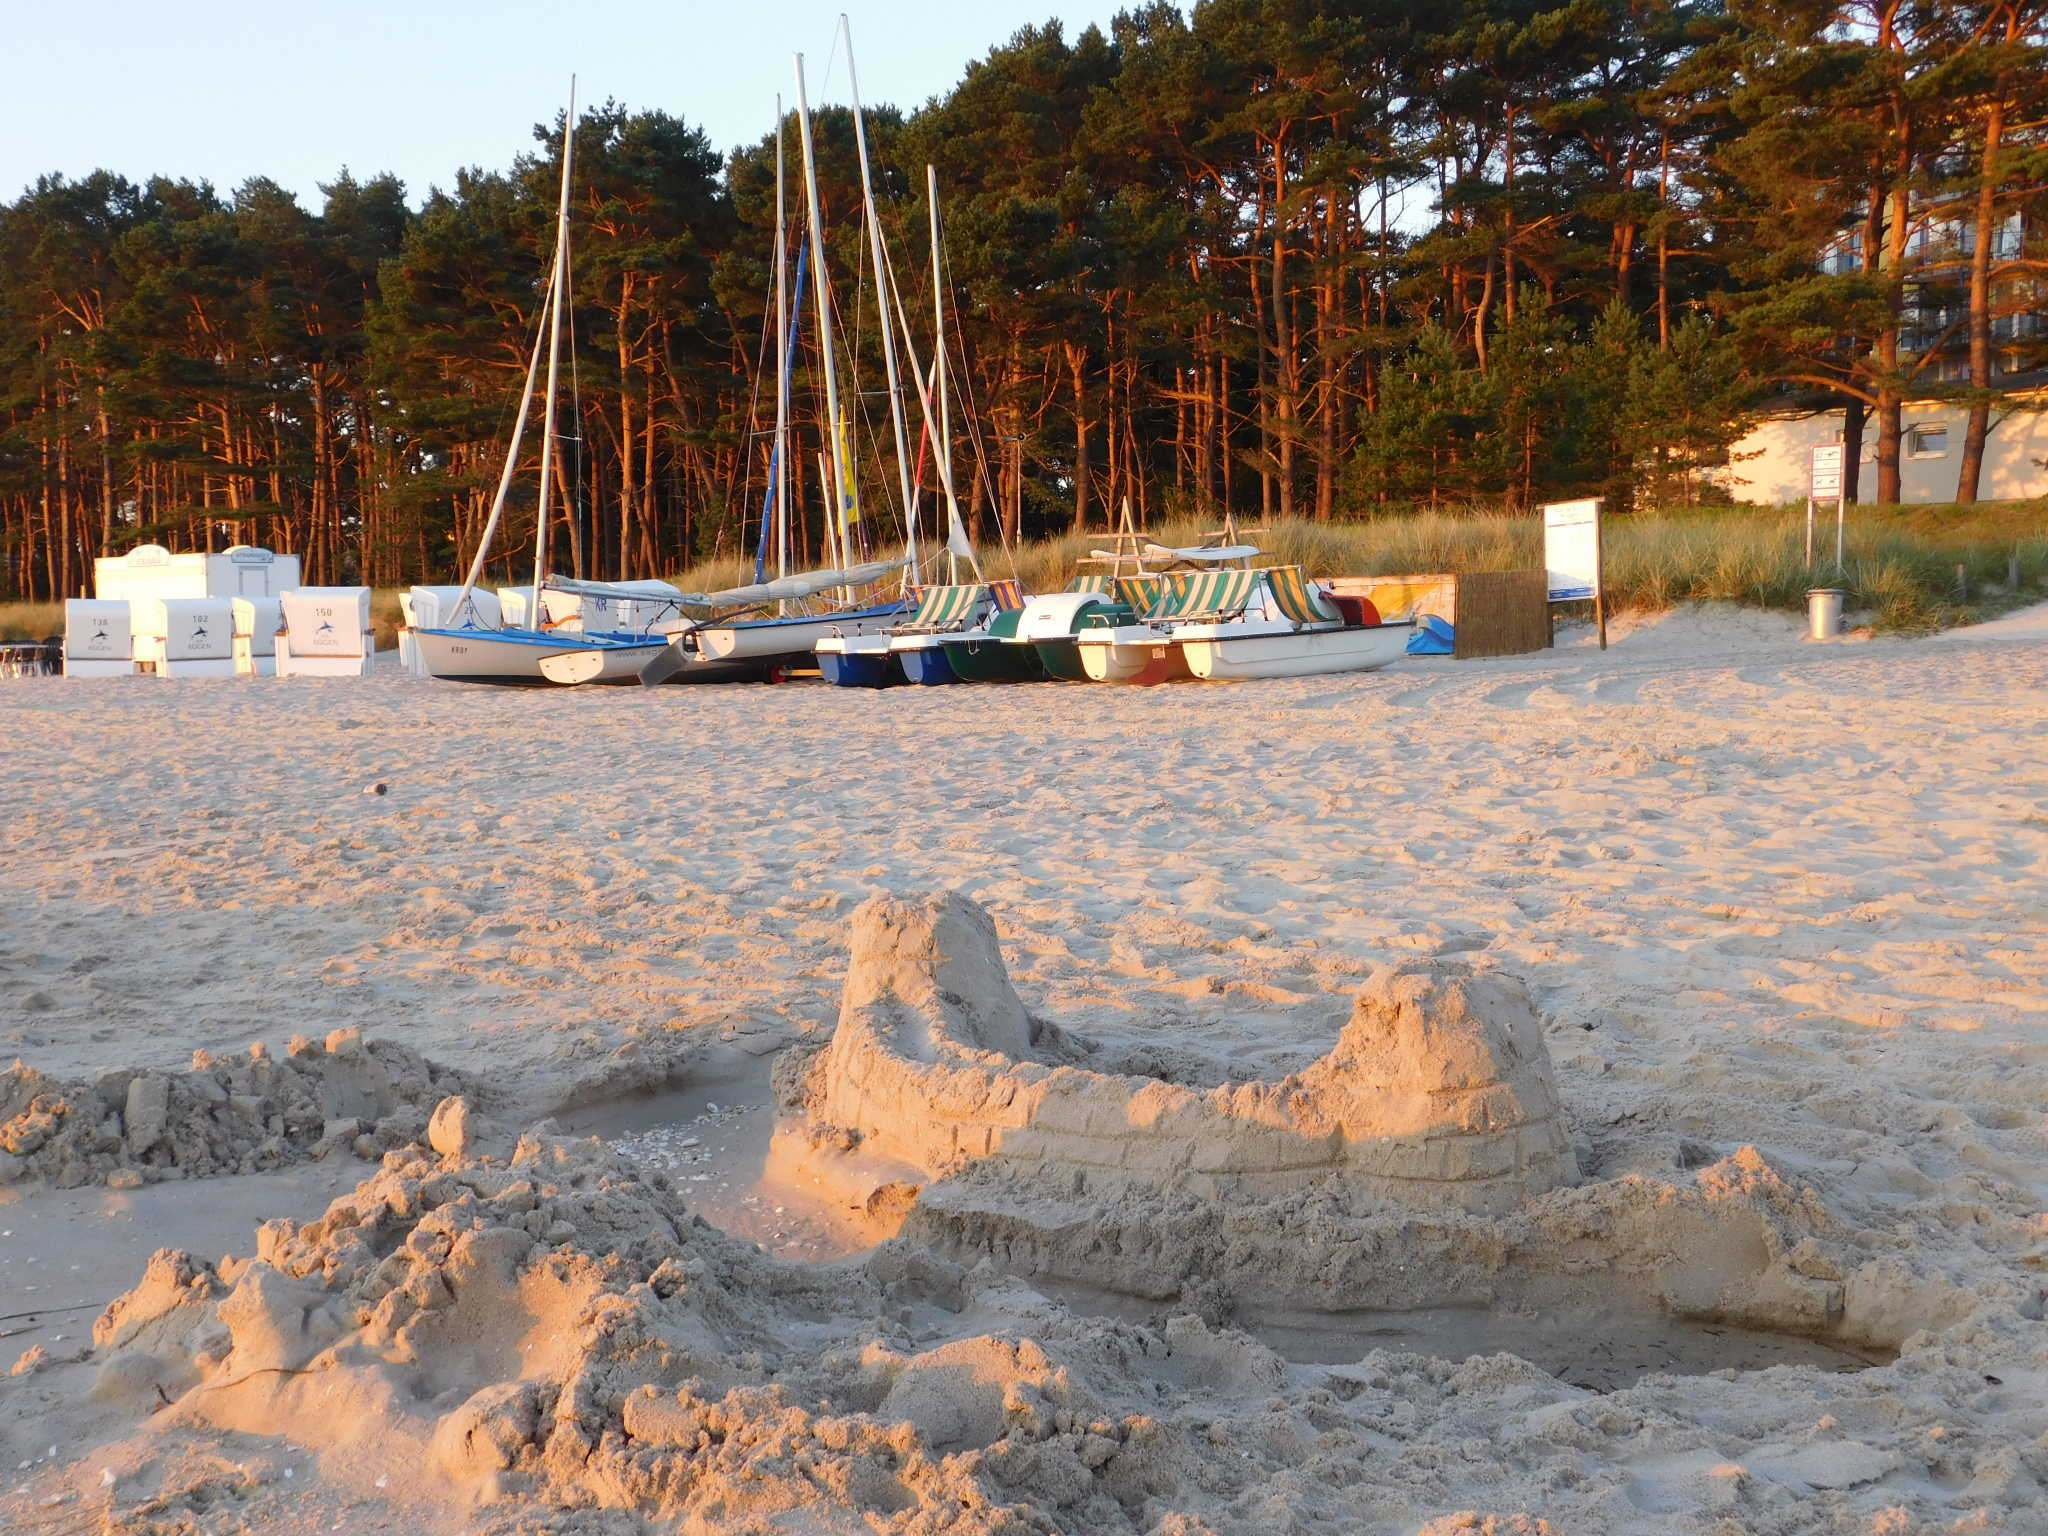 Urlaubssonne an unserem Strandabschnitt.